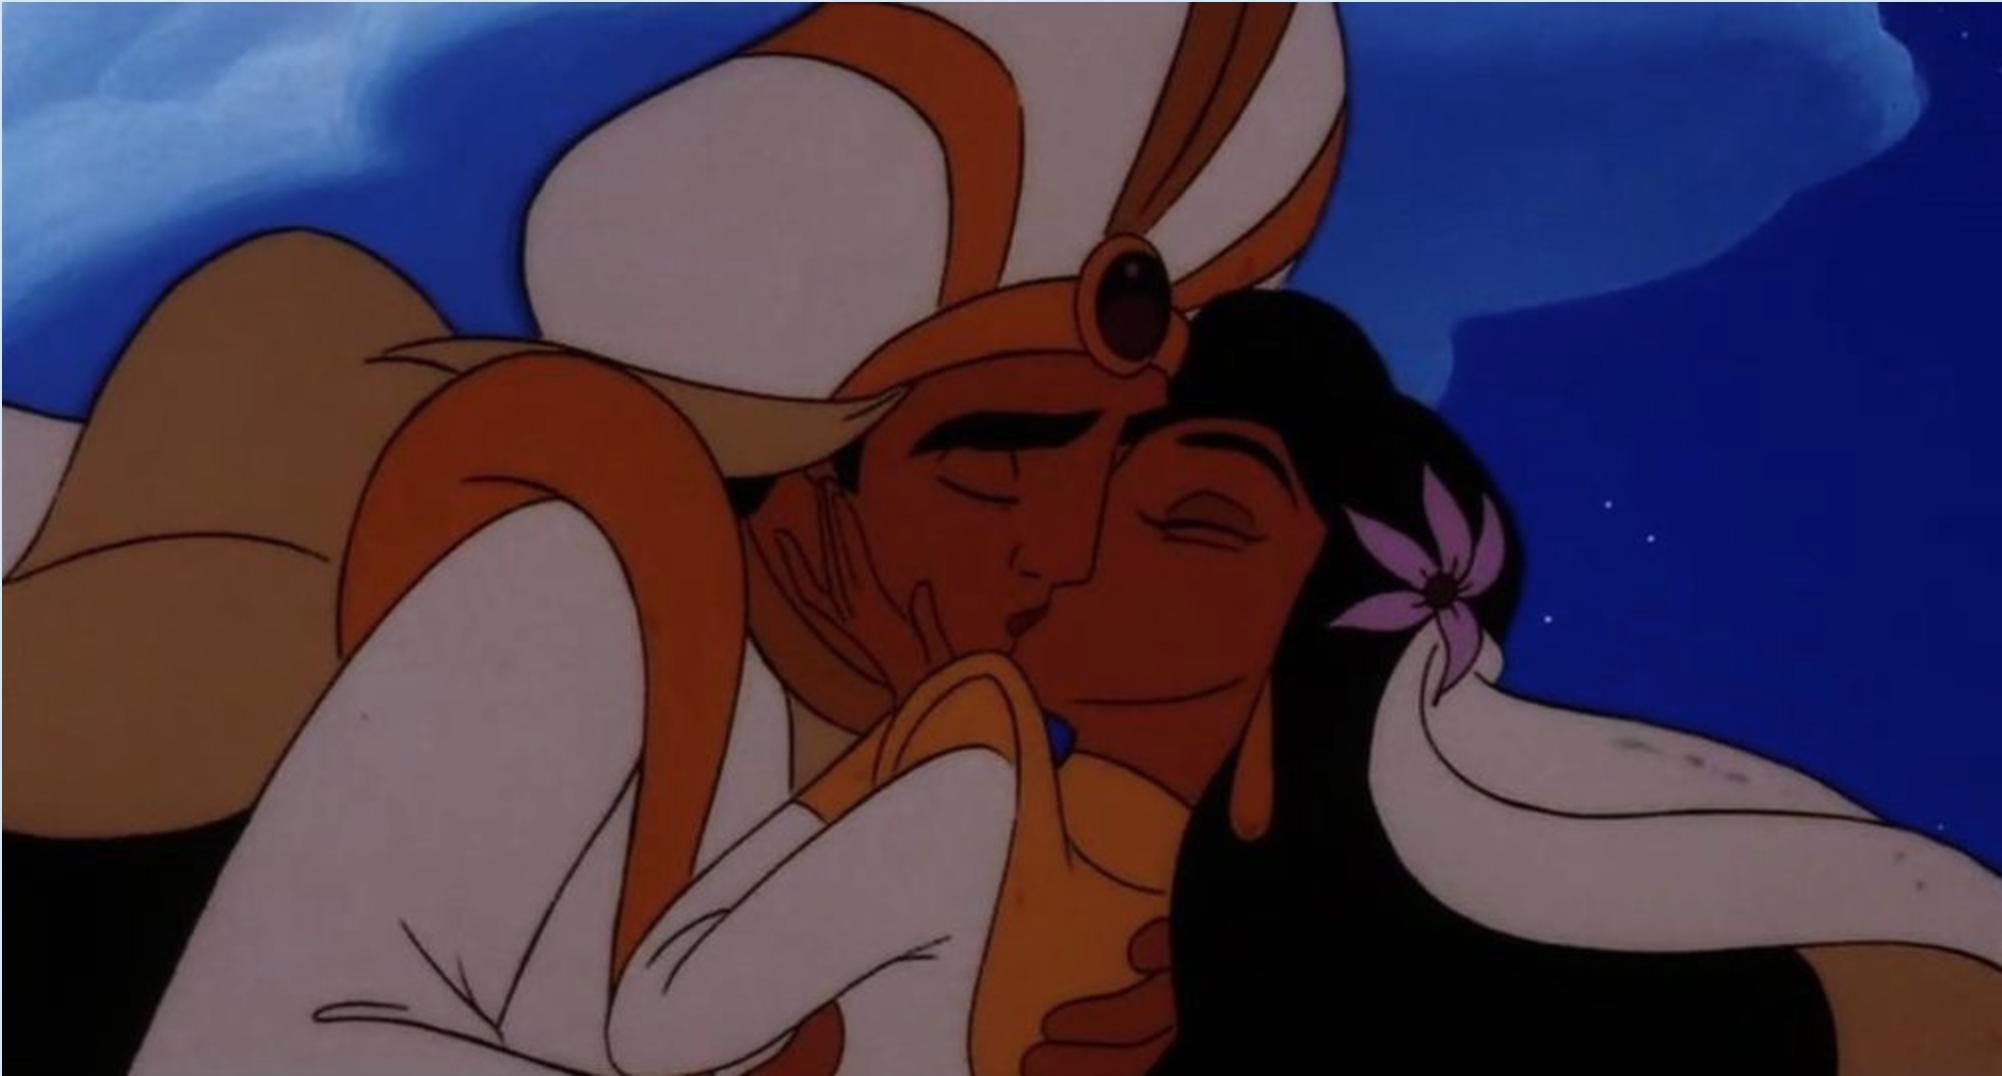 Jasmine and Aladdin sharing a romantic kiss on their Royal Wedding ...